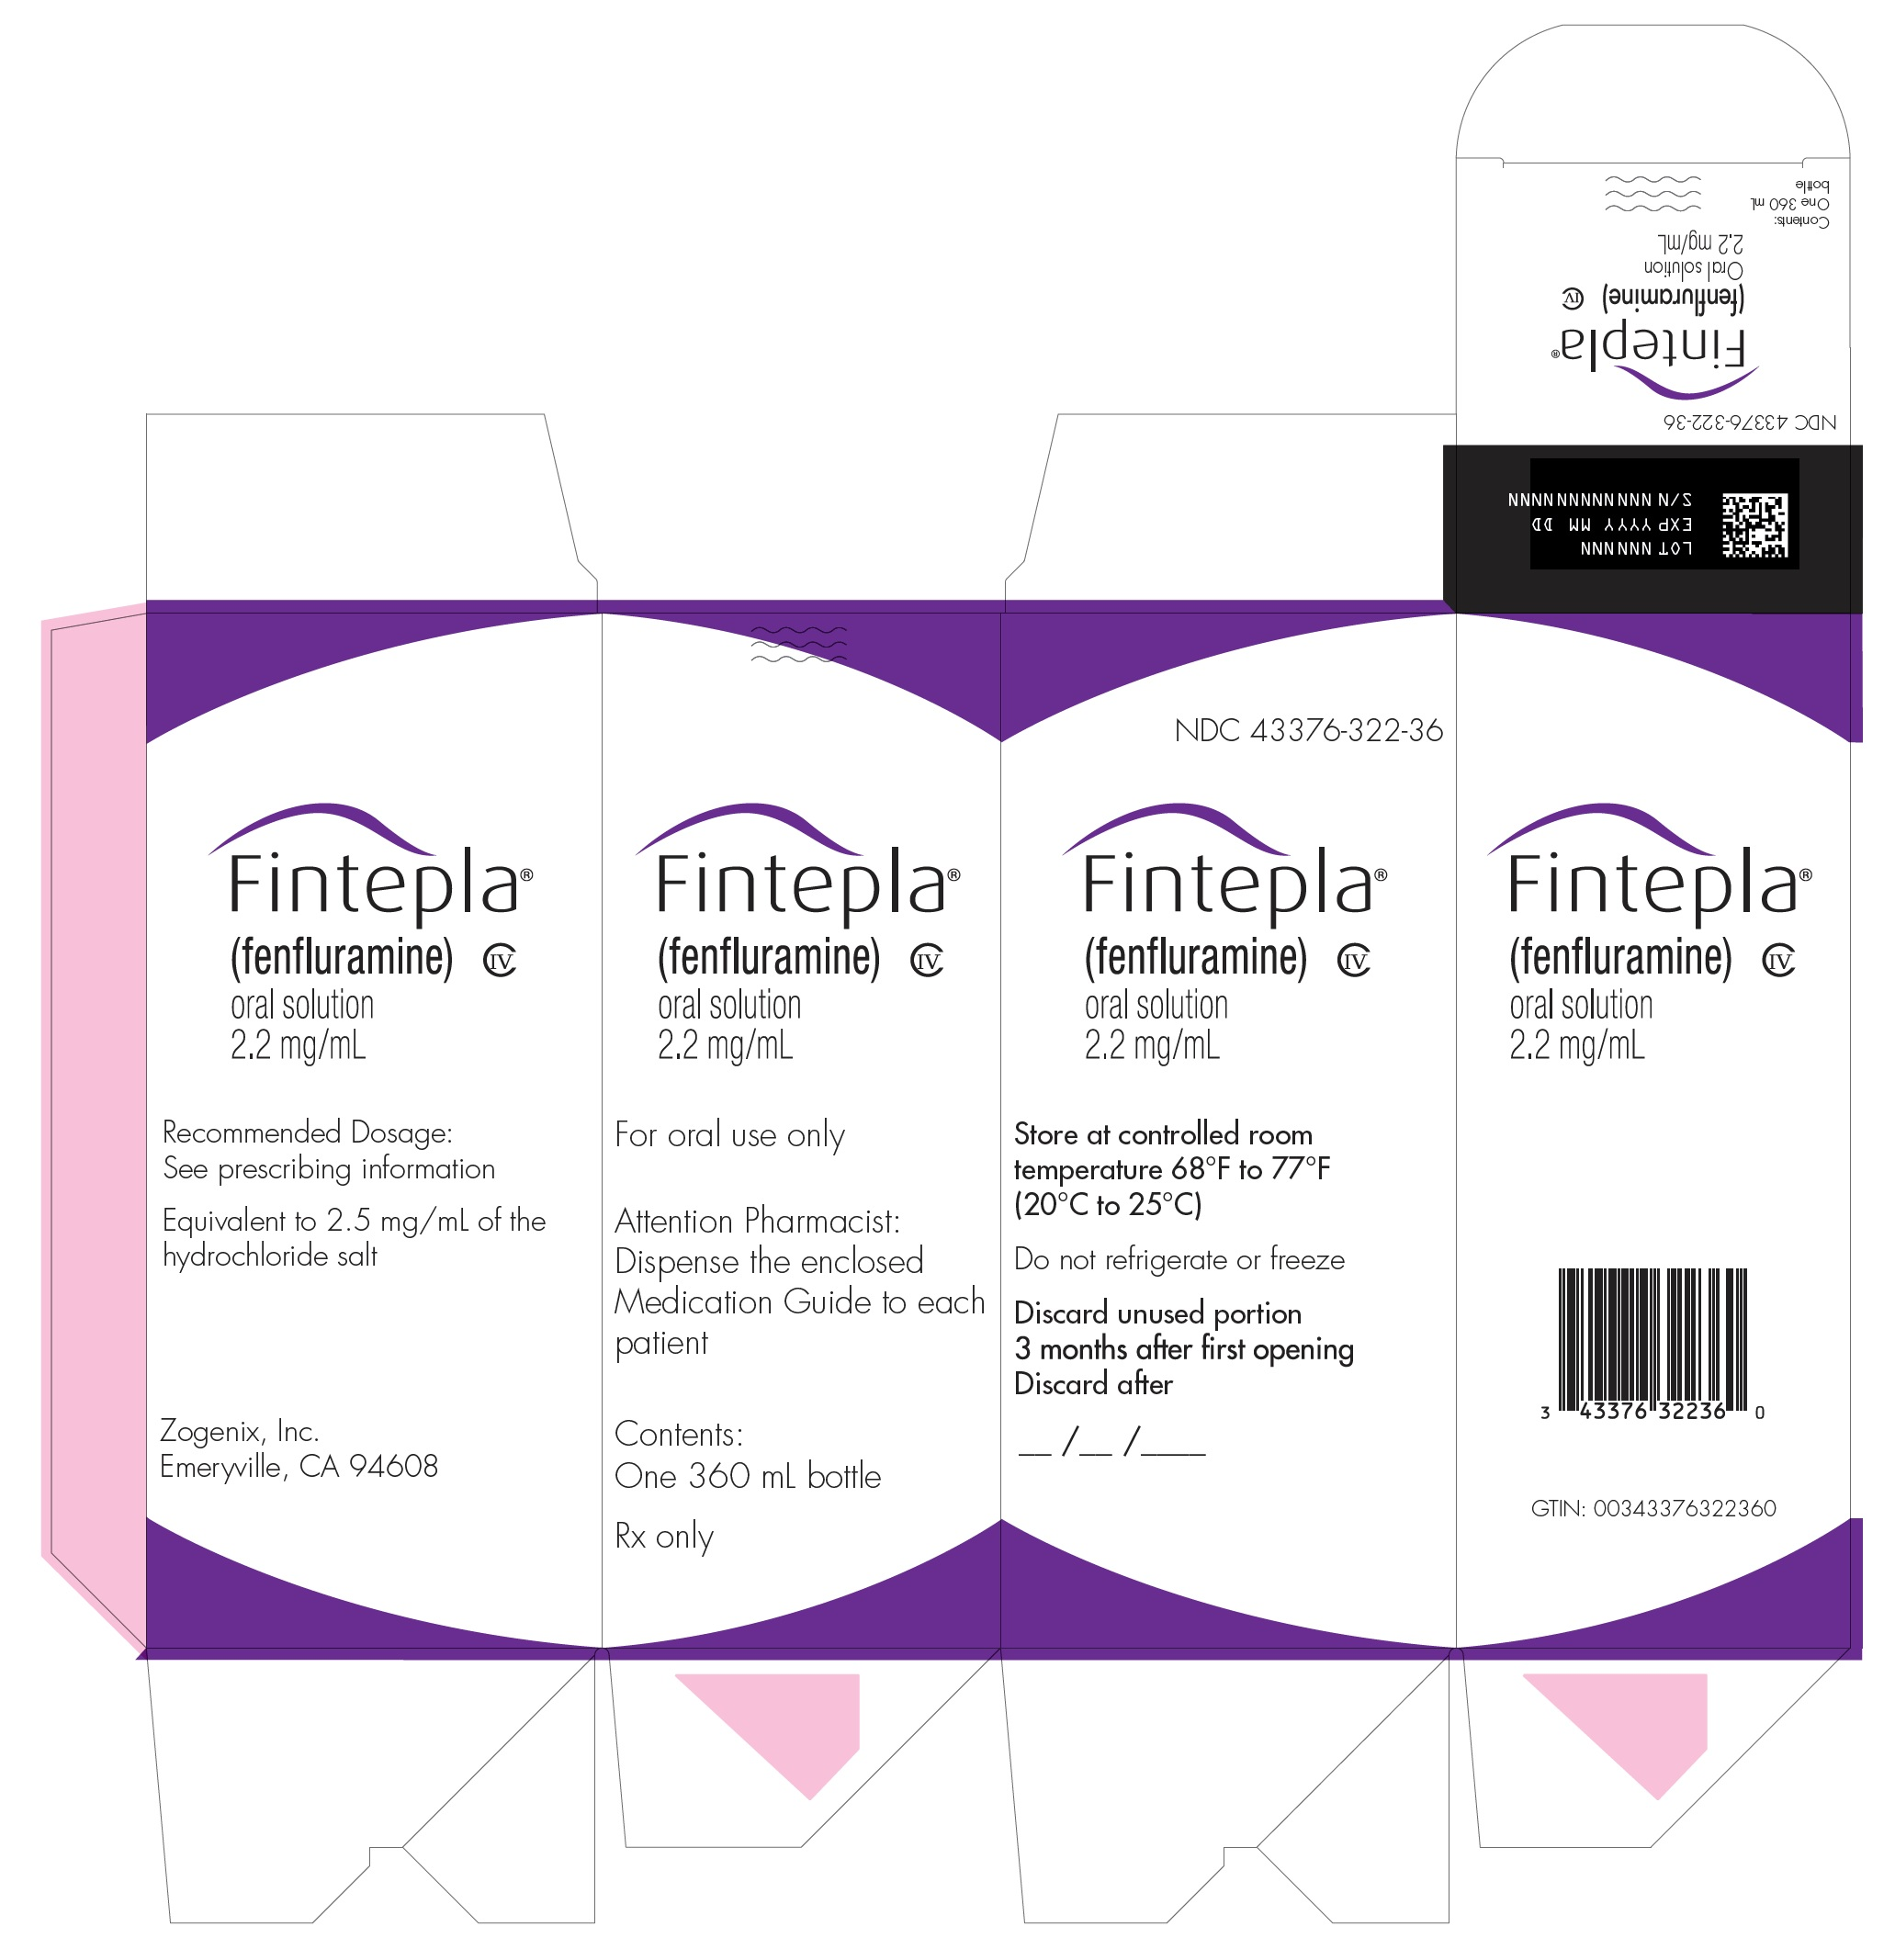 360 mL Carton Label